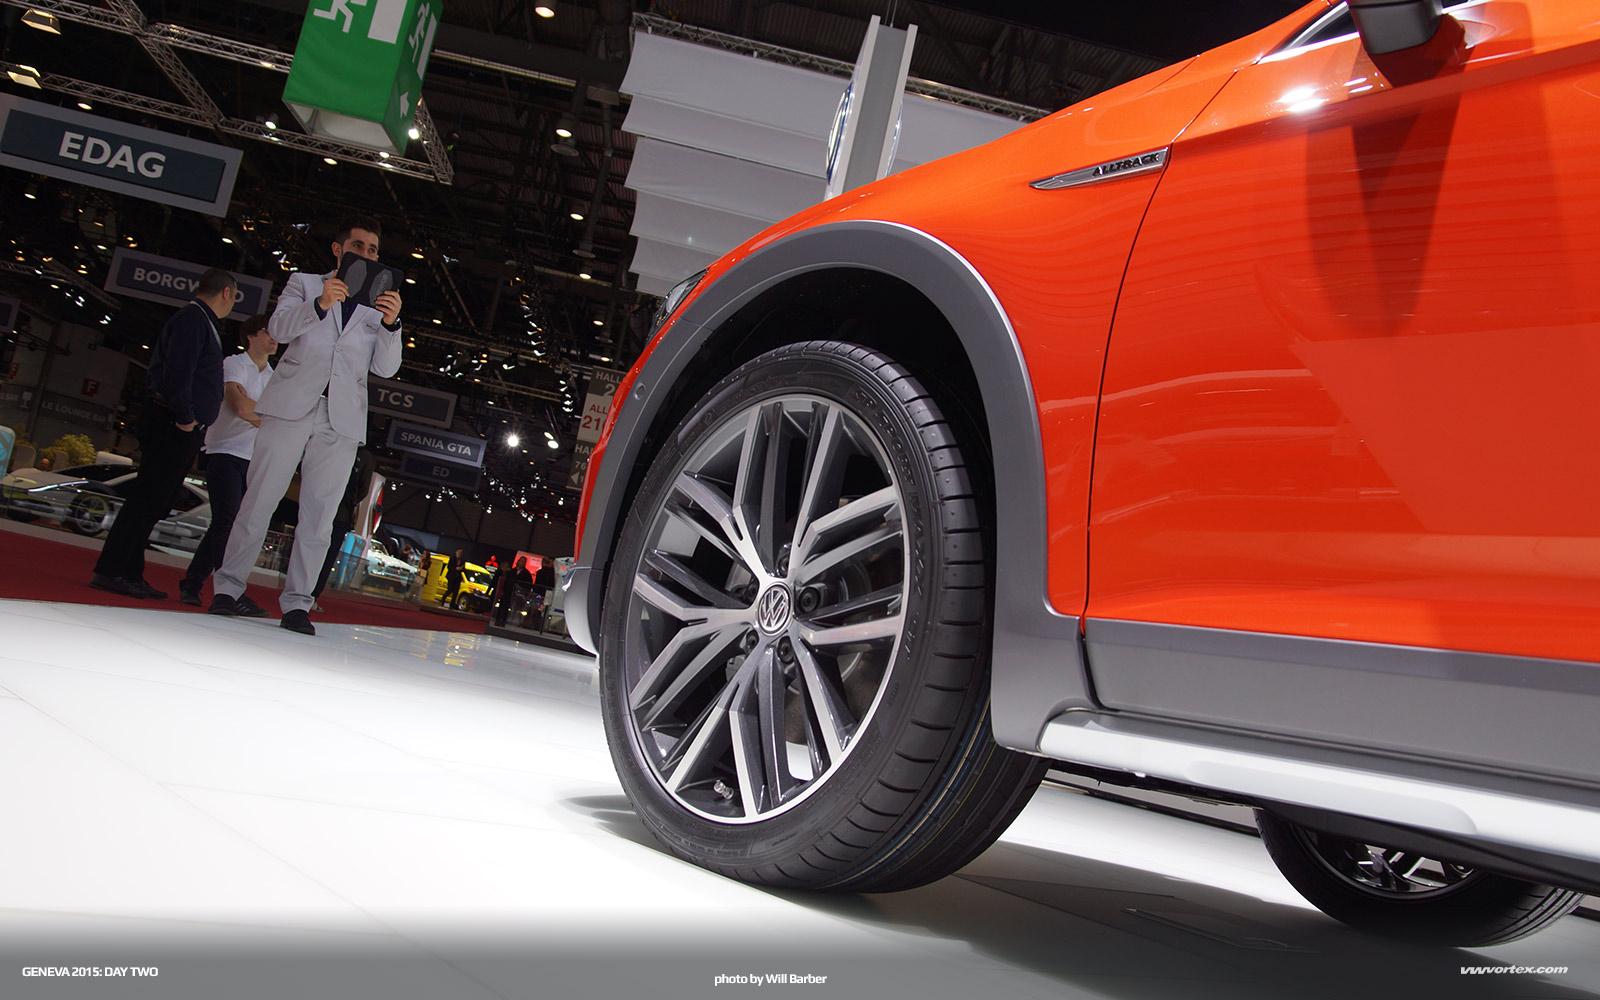 Geneva-2015-Day-Two-Volkswagen-Group-432